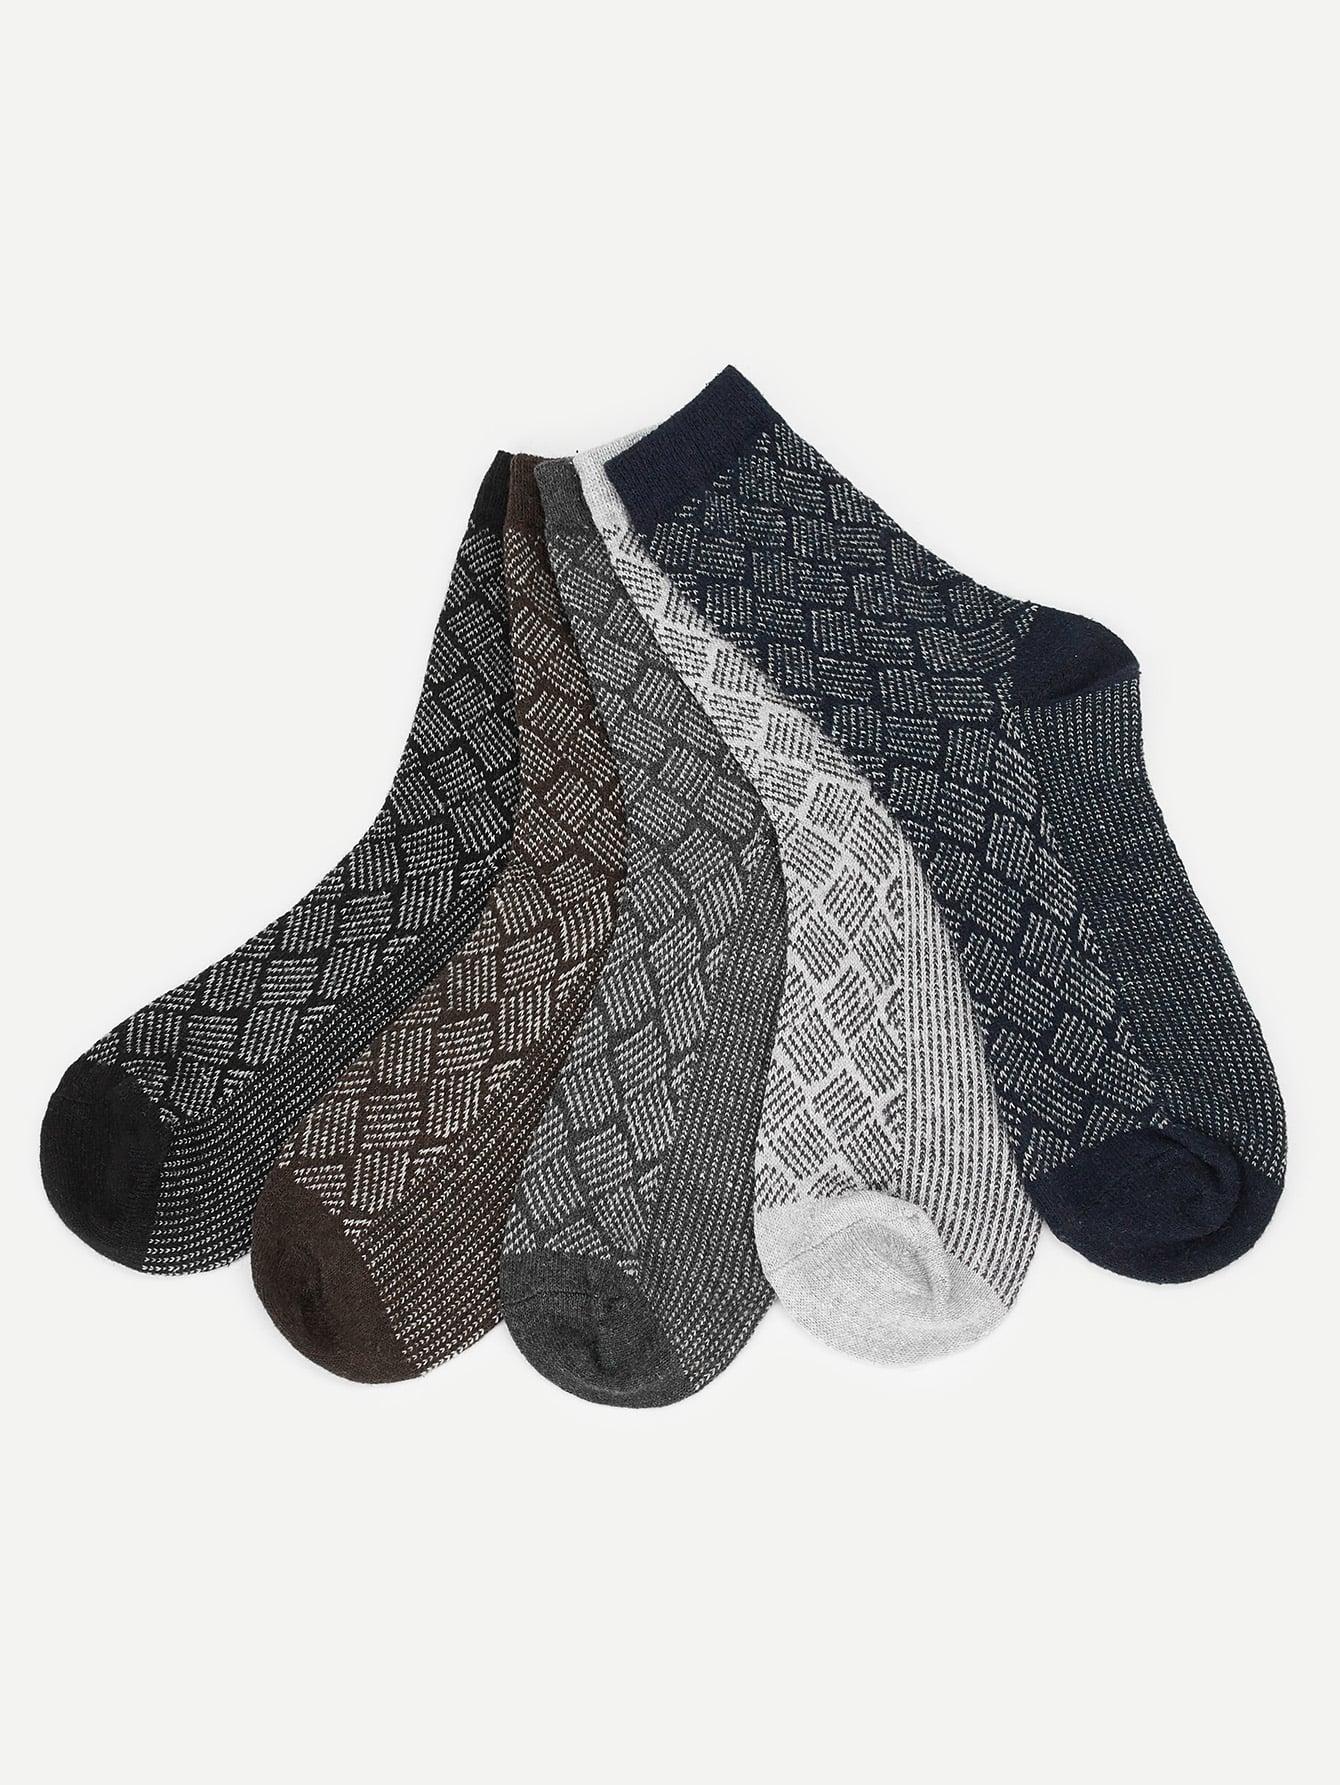 Купить Мужские геометрические носки 5 пар, null, SheIn